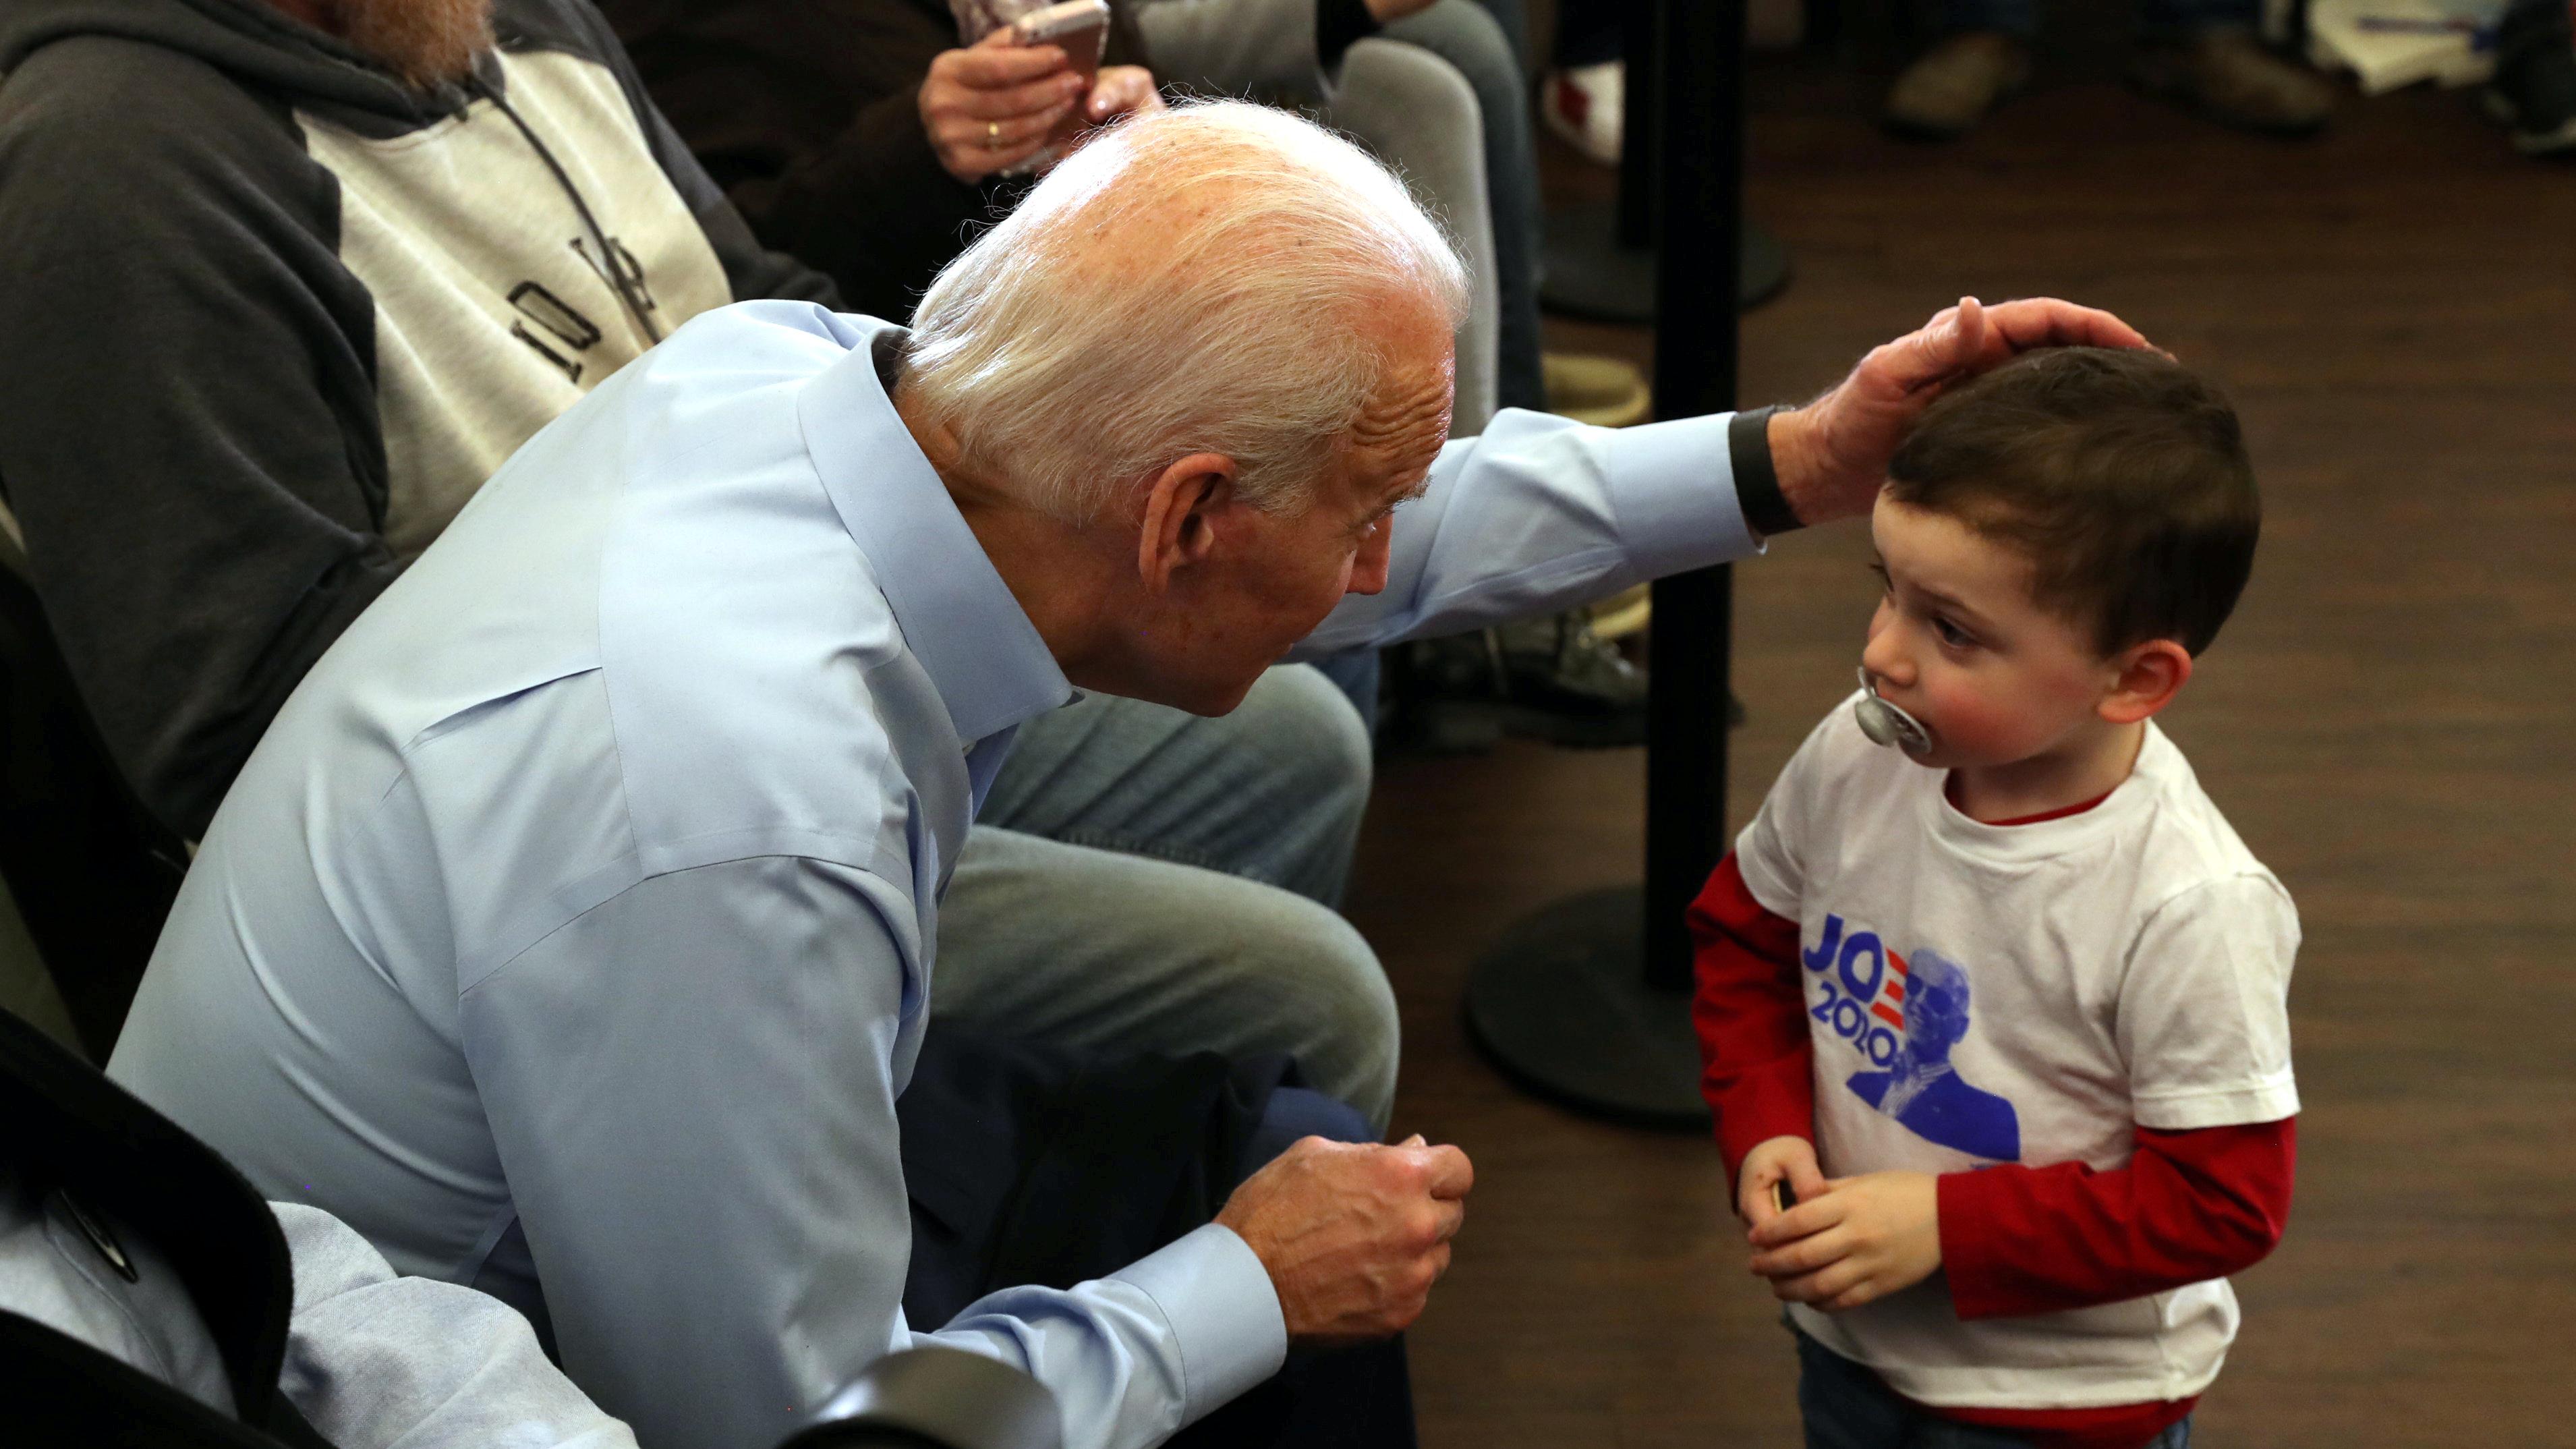 Joe Biden talks to a child at a campaign event